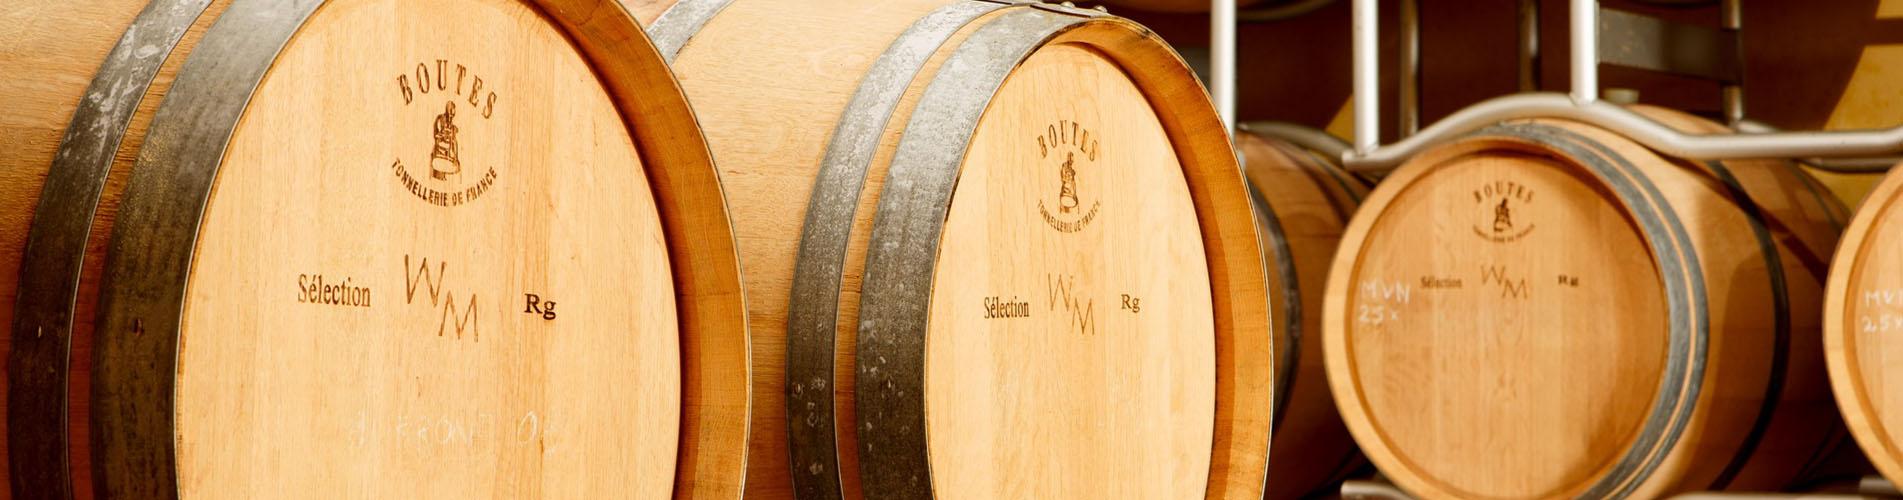 winery_slide2